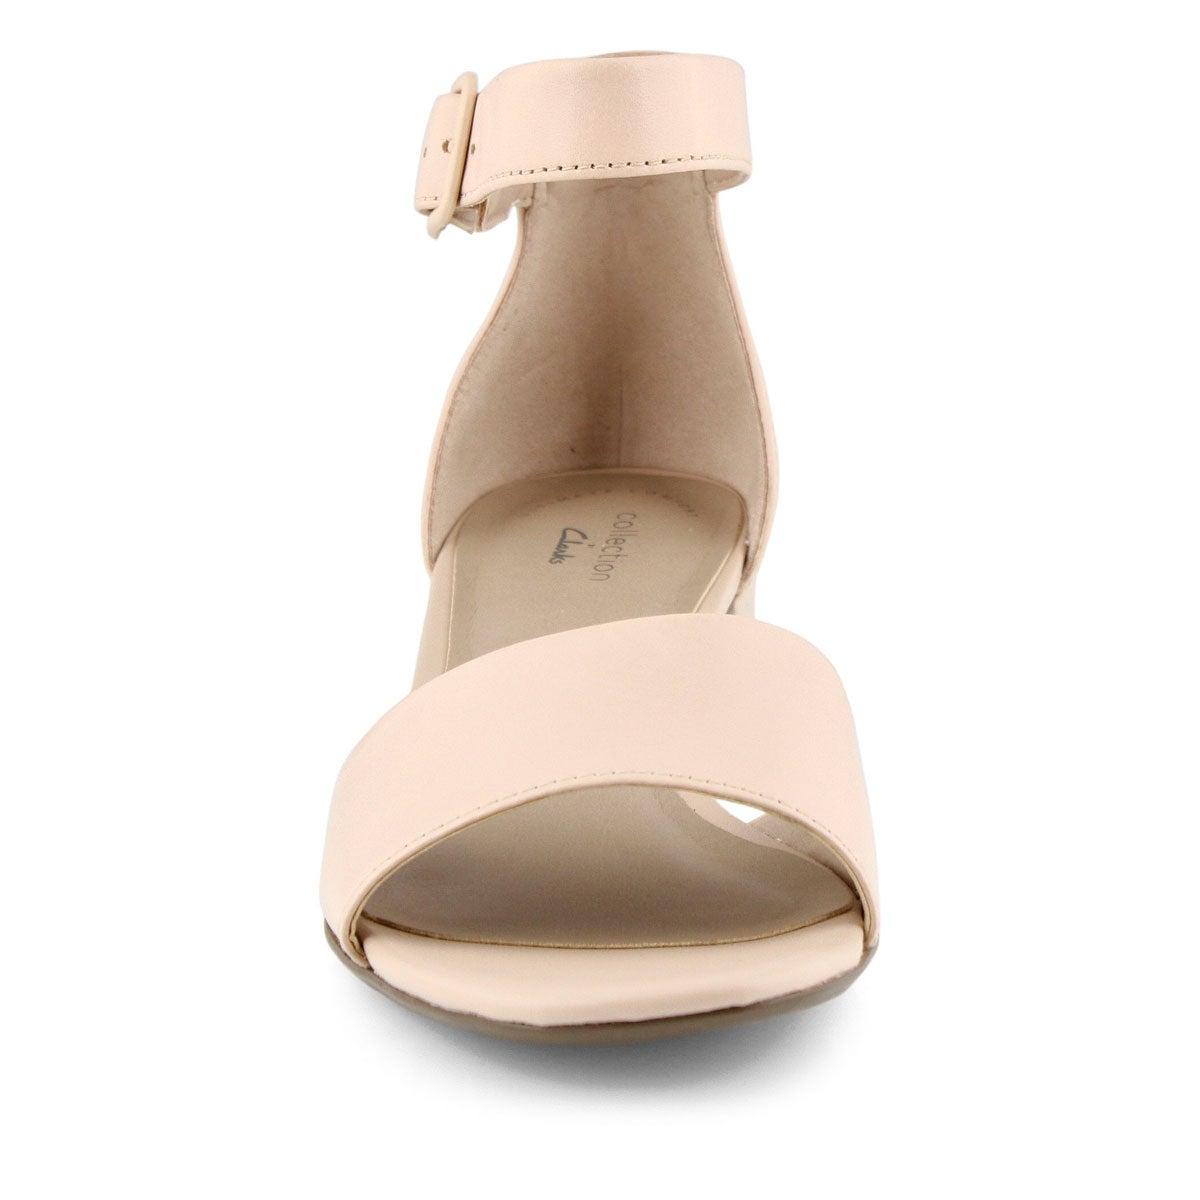 Lds Elisa Dedra blush dress sandal